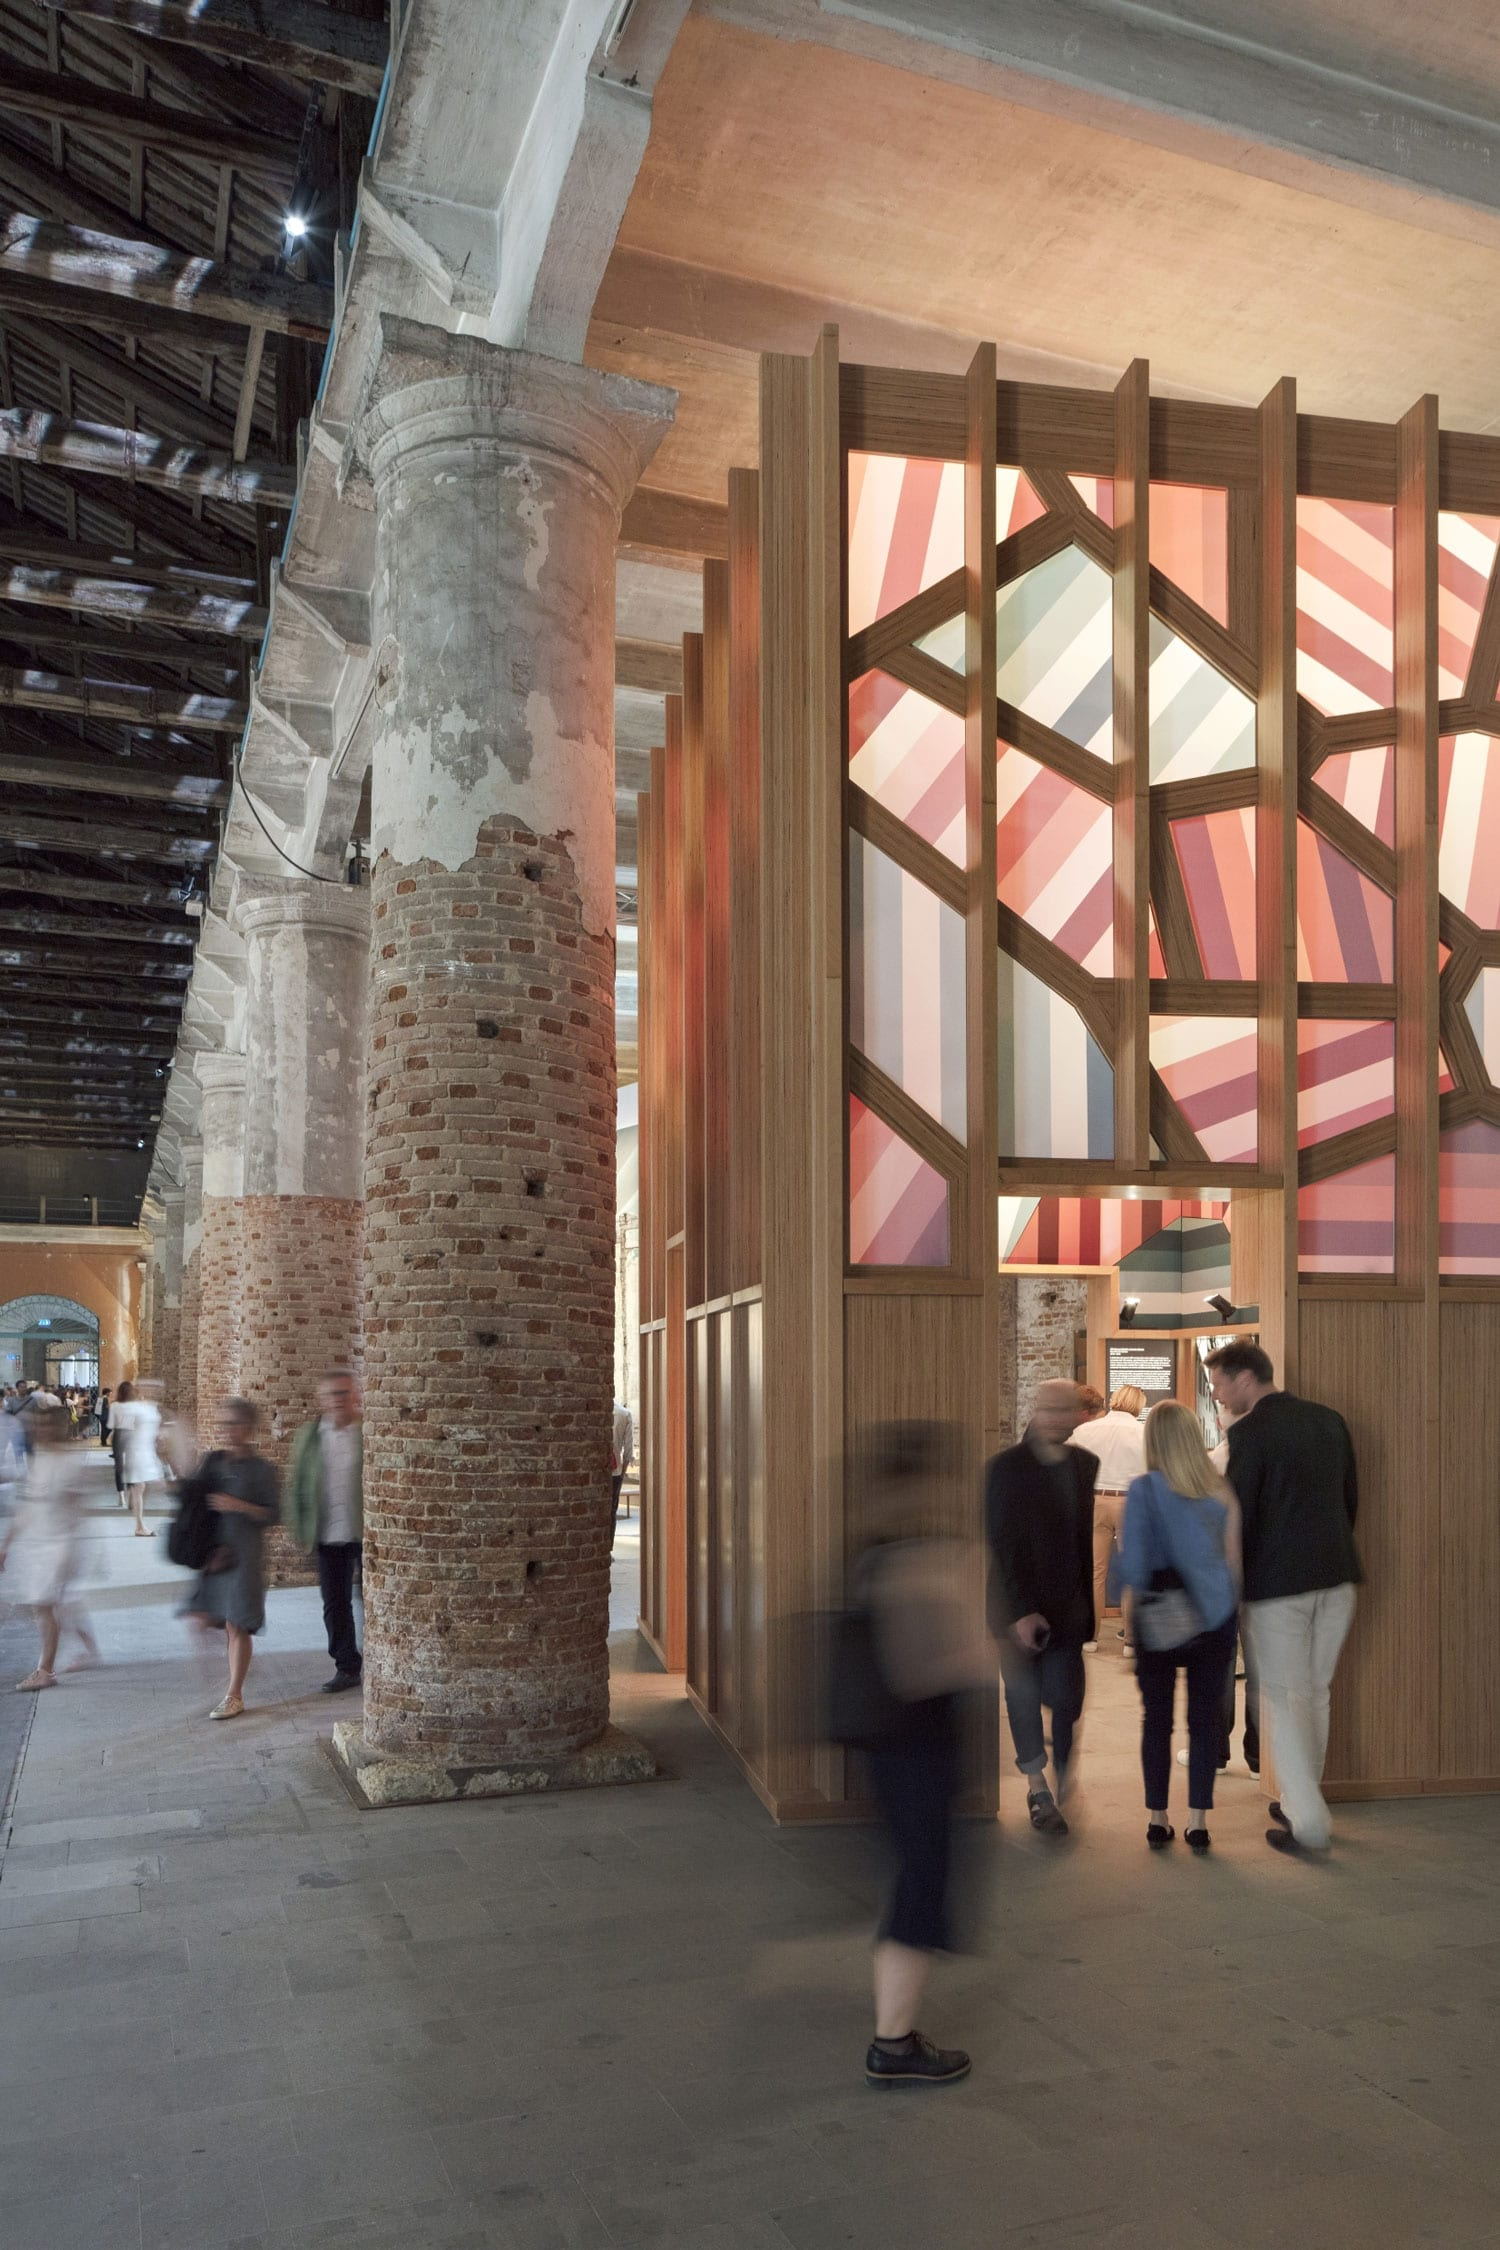 Liquid Light by Flores & Prats, Venice Architecture Biennale 2018 | Yellowtrace